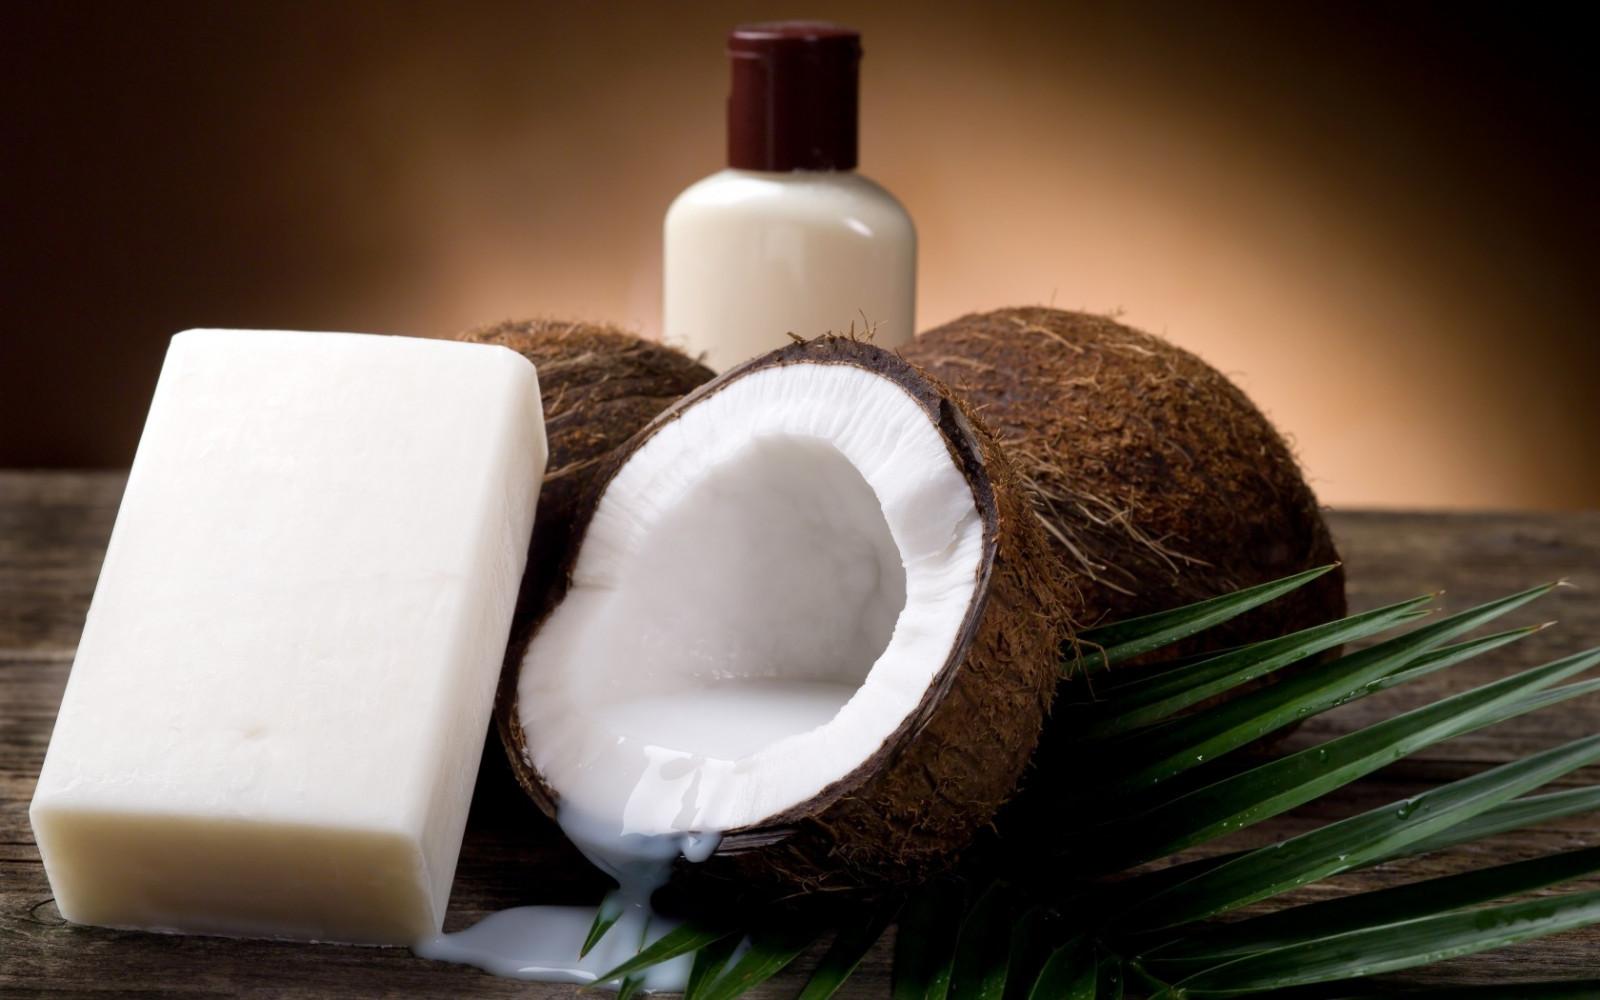 food, table, soap, coconuts, bottle, coconut, flavor